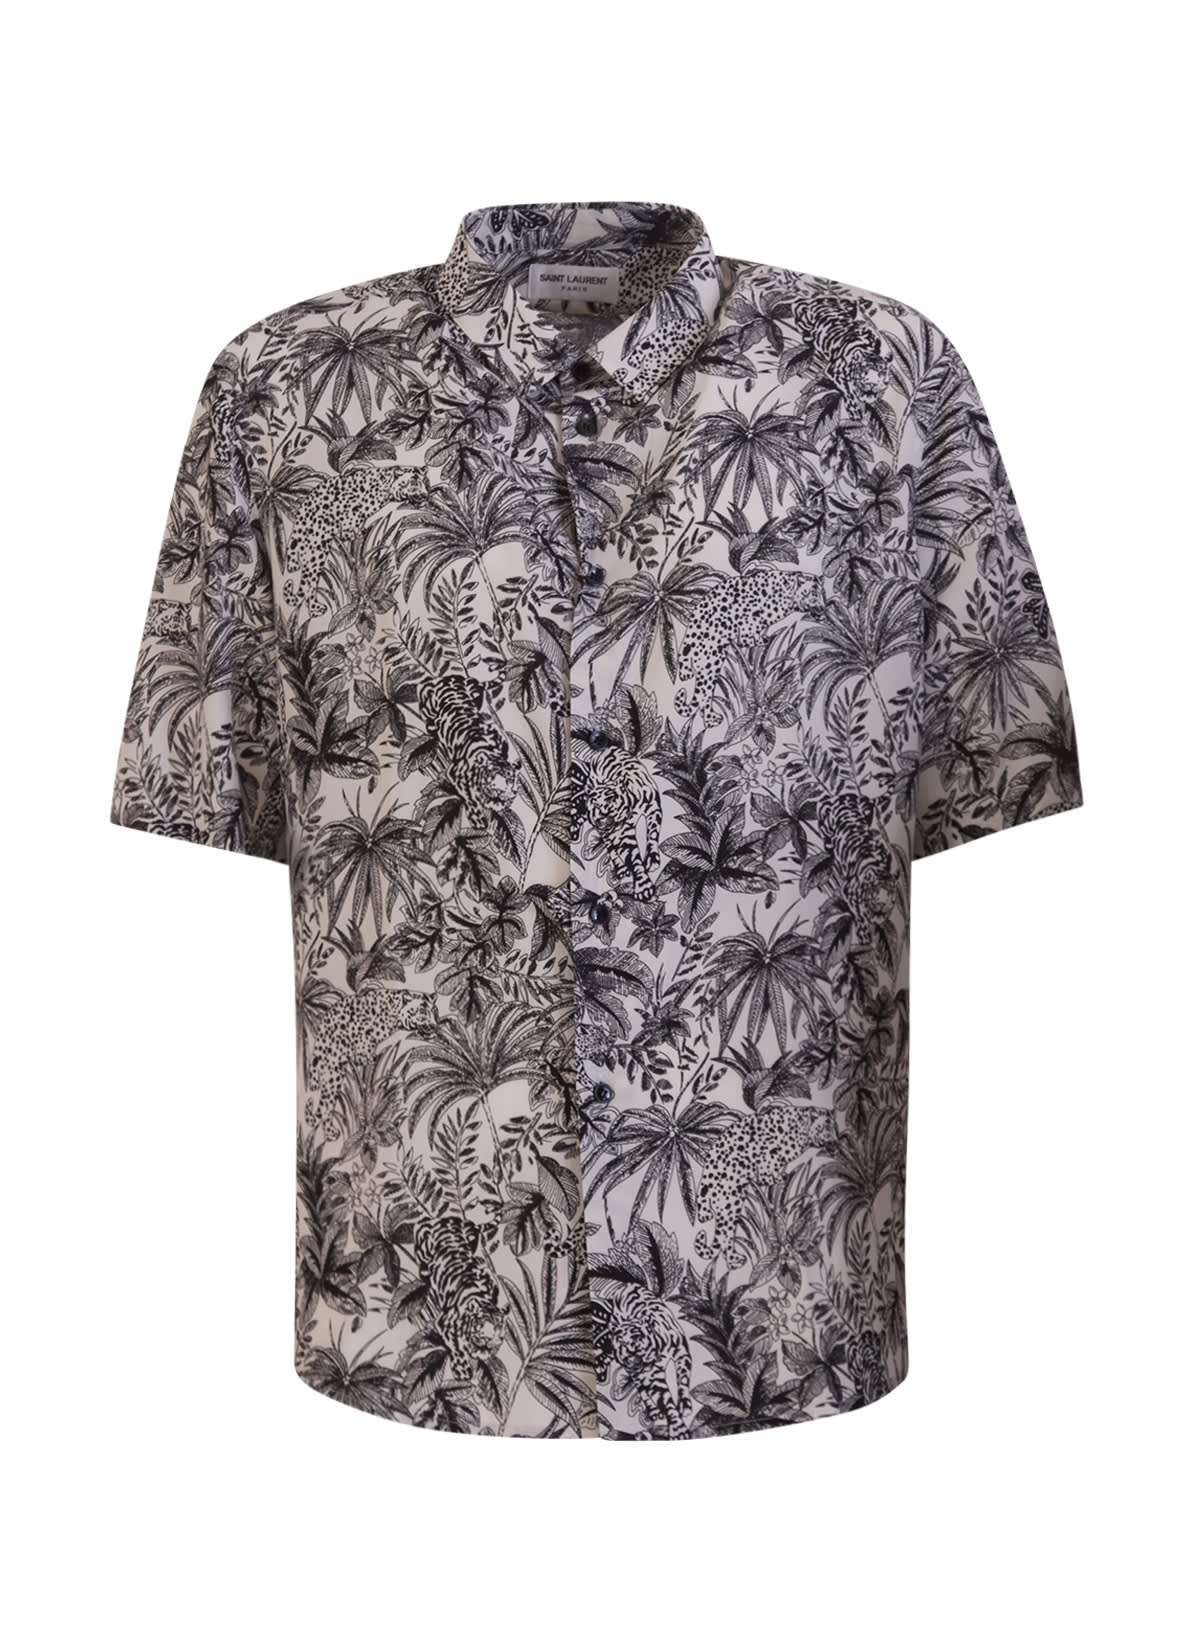 Saint Laurent Shirts SHIRT IN VISCOSE